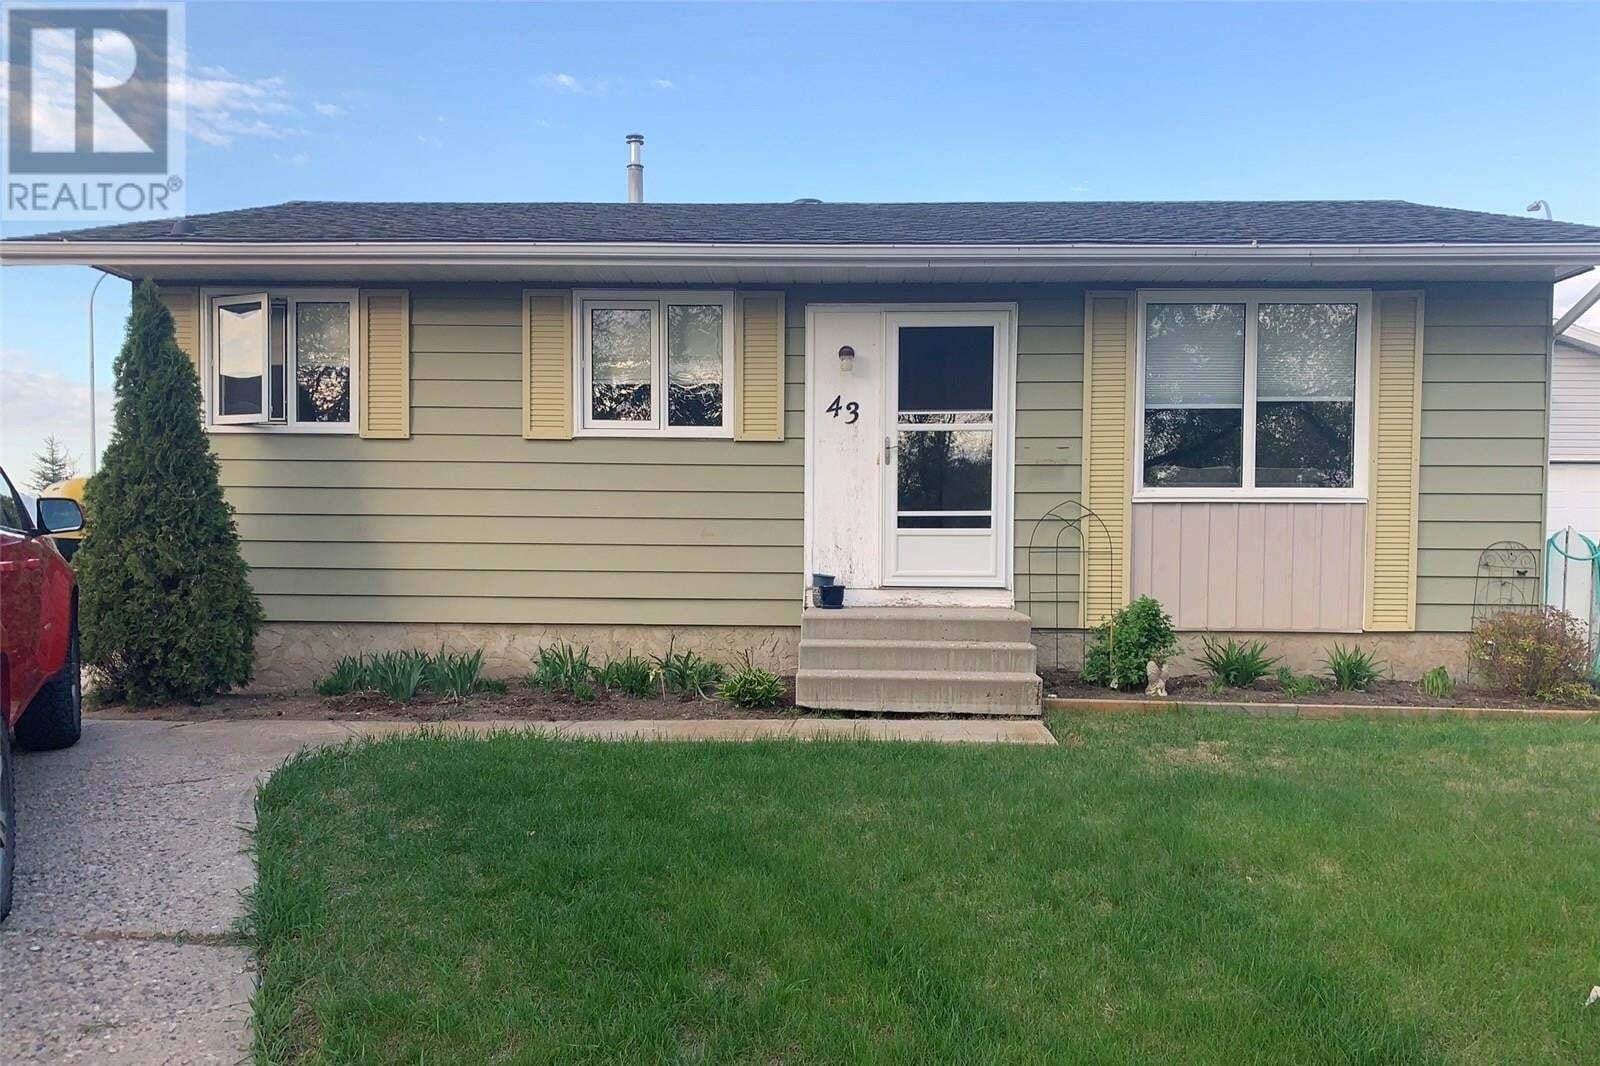 House for sale at 43 Trifunov Cres Regina Saskatchewan - MLS: SK809875